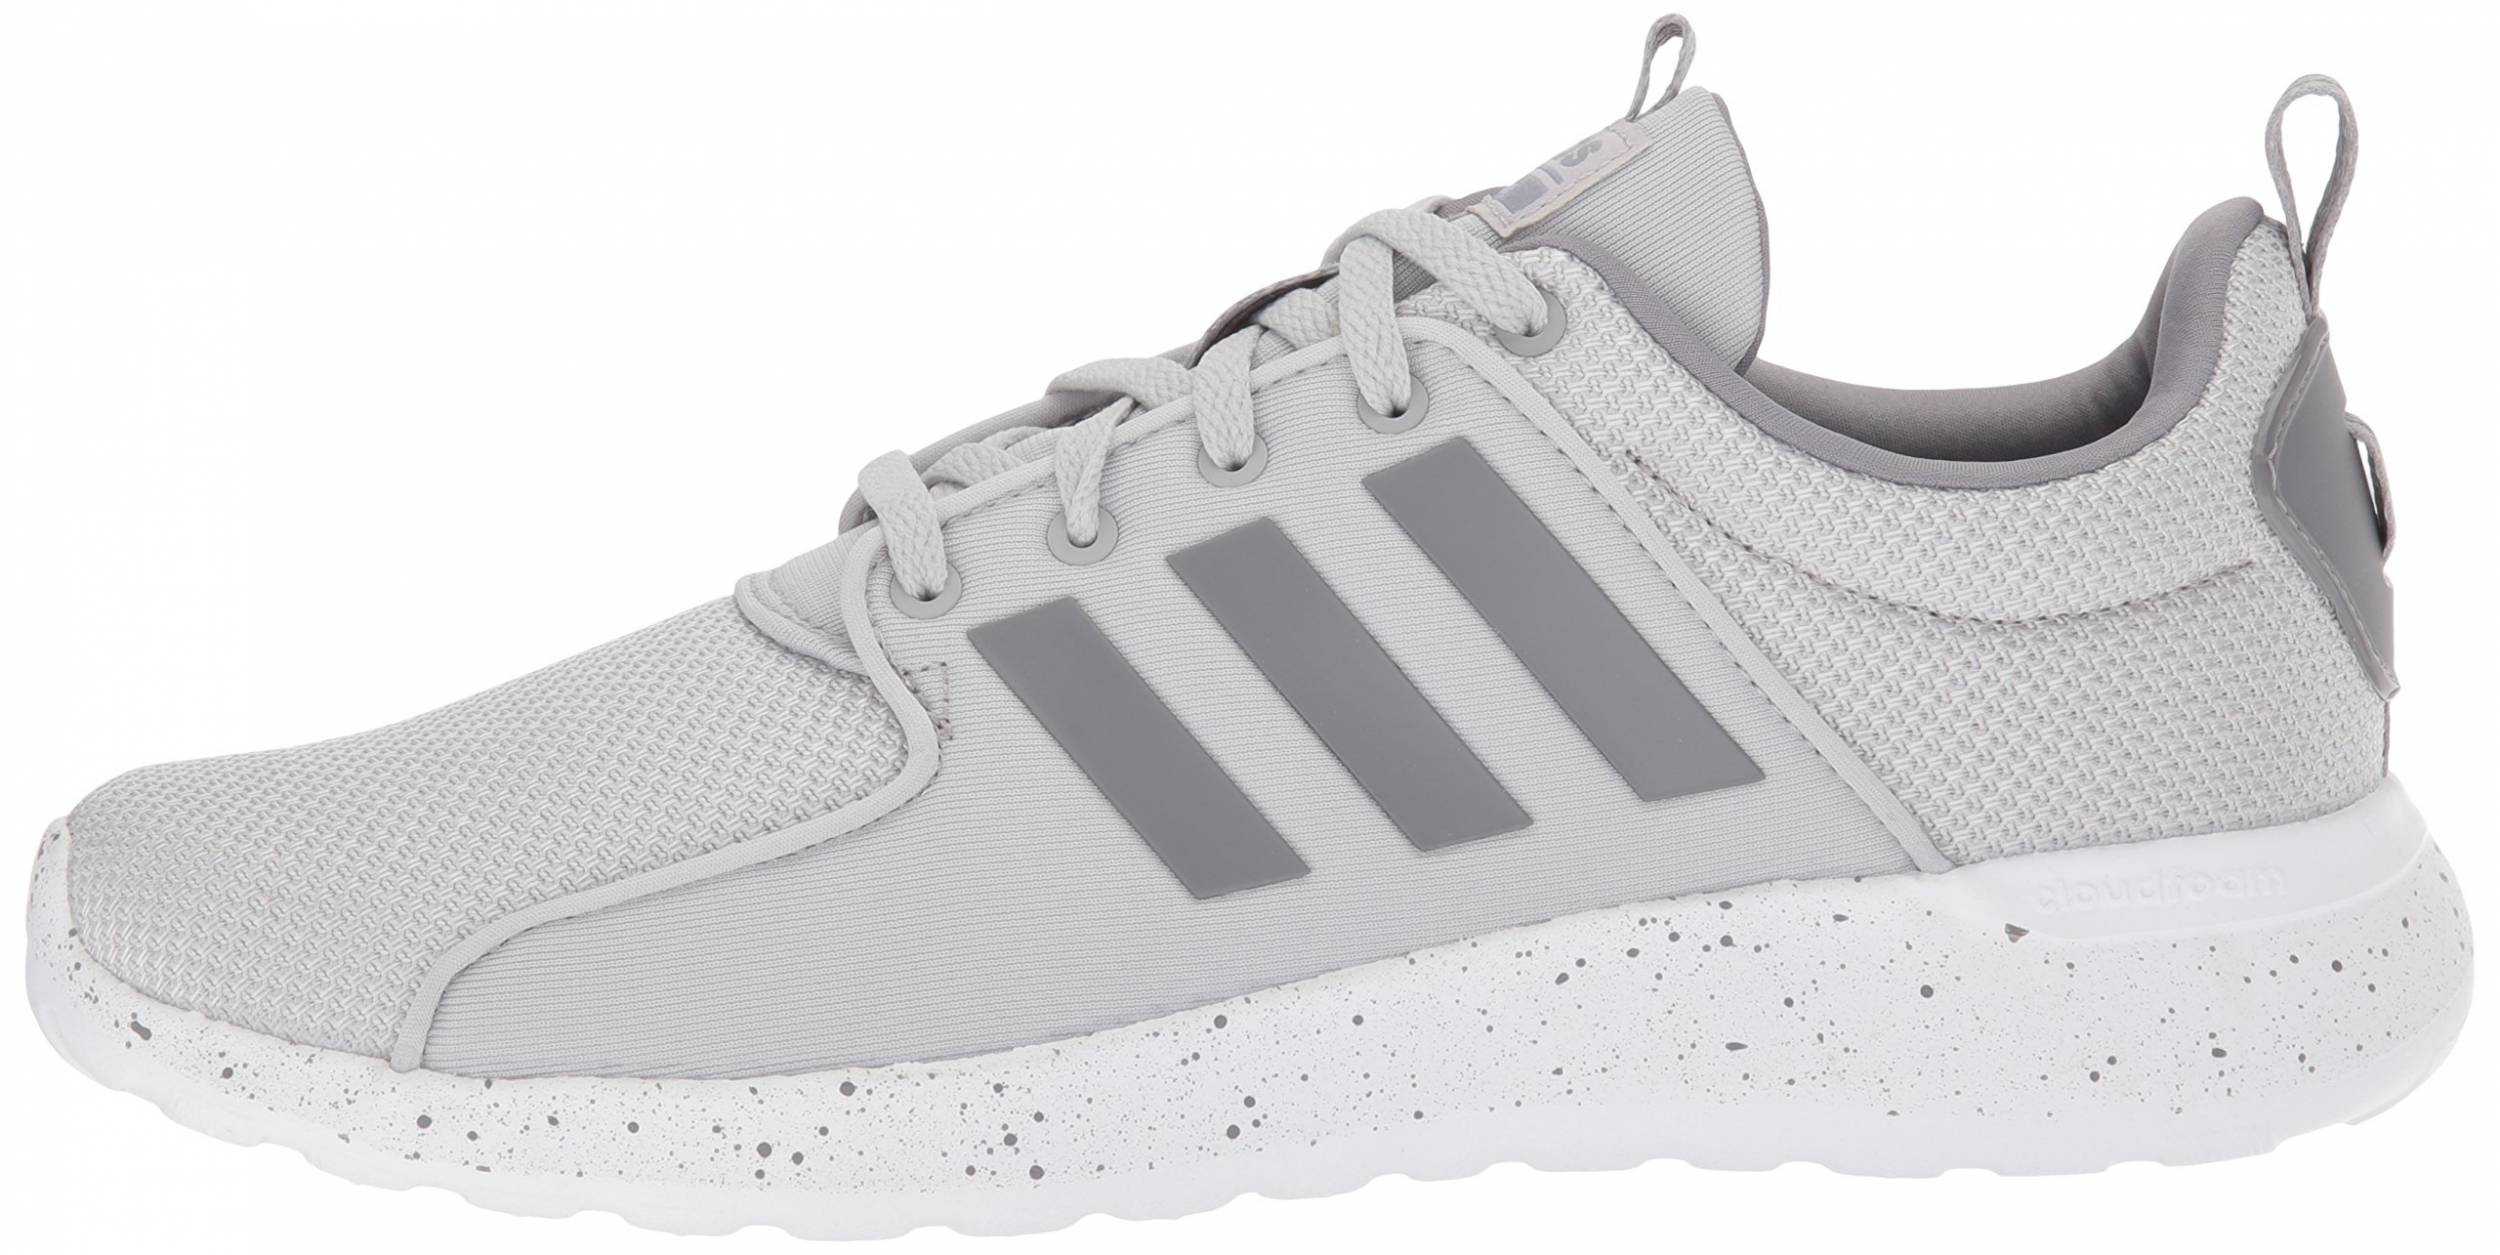 40 Adidas NEO sneakers - Save 39% | RunRepeat